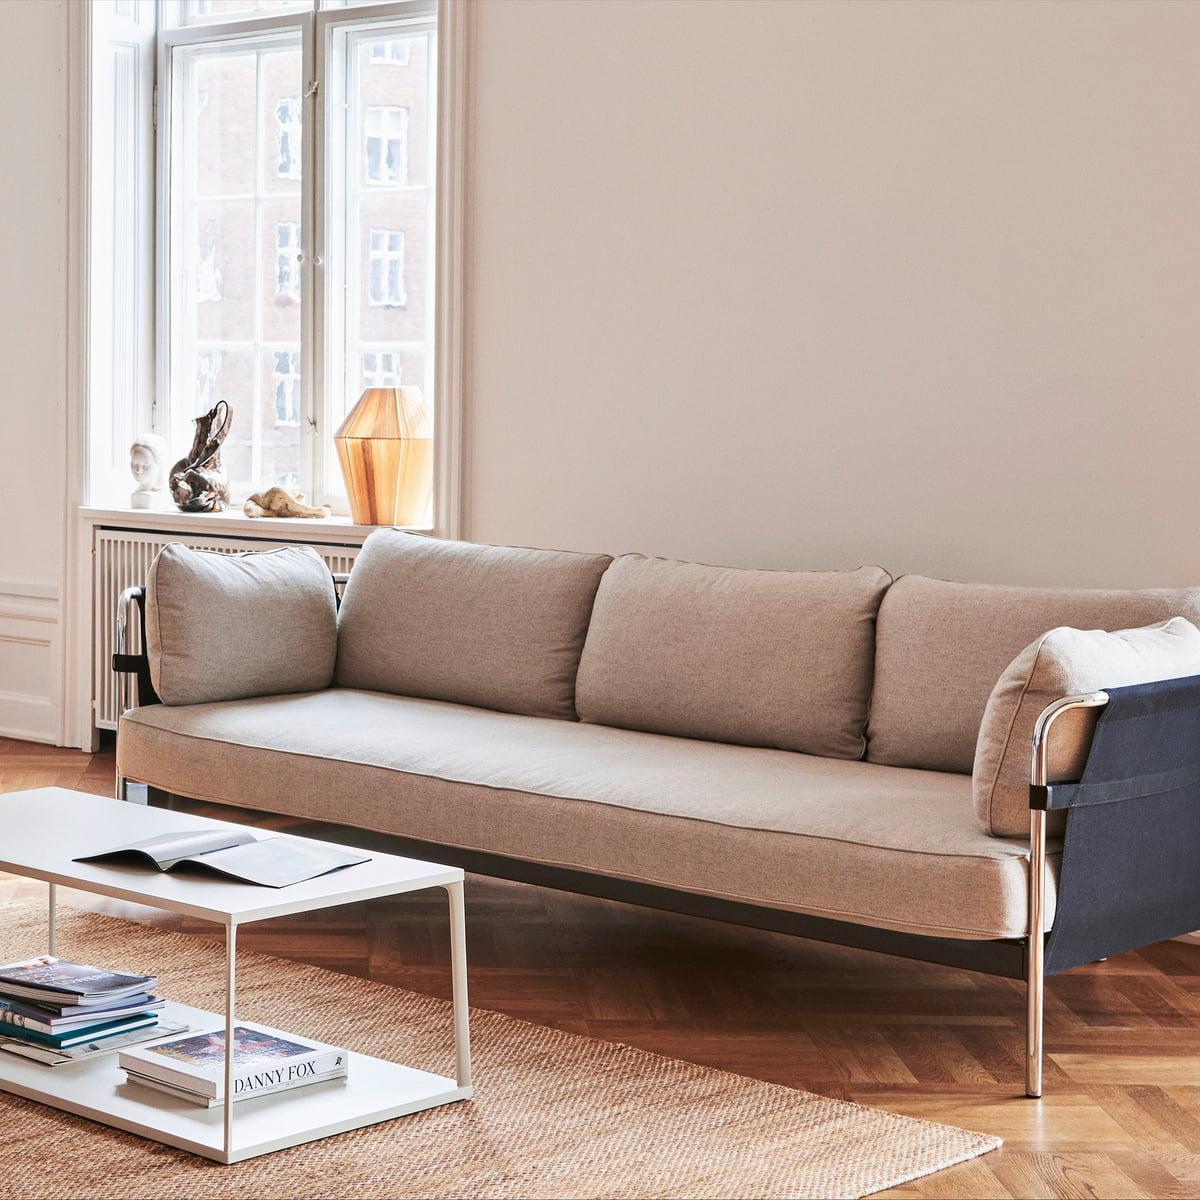 https://www.connox.de/kategorien/moebel/sofas/carl-hansen ...